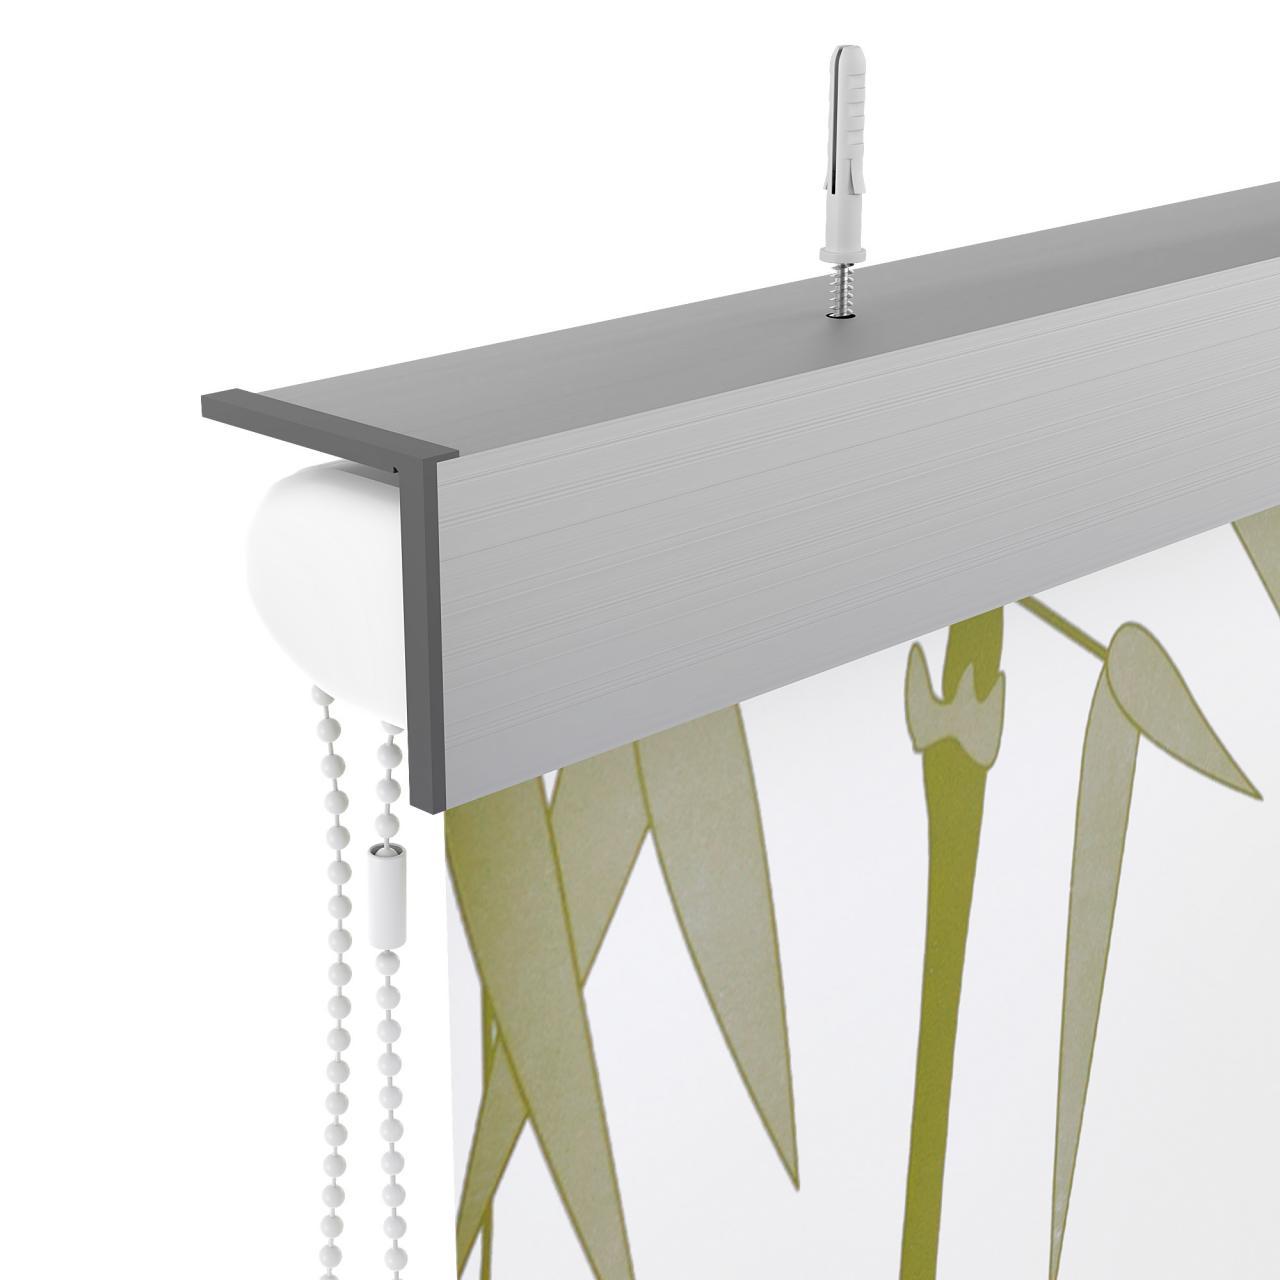 duschrollo alu halbkassette duschvorhang dusche badewannenvorhang bad seitenzug ebay. Black Bedroom Furniture Sets. Home Design Ideas